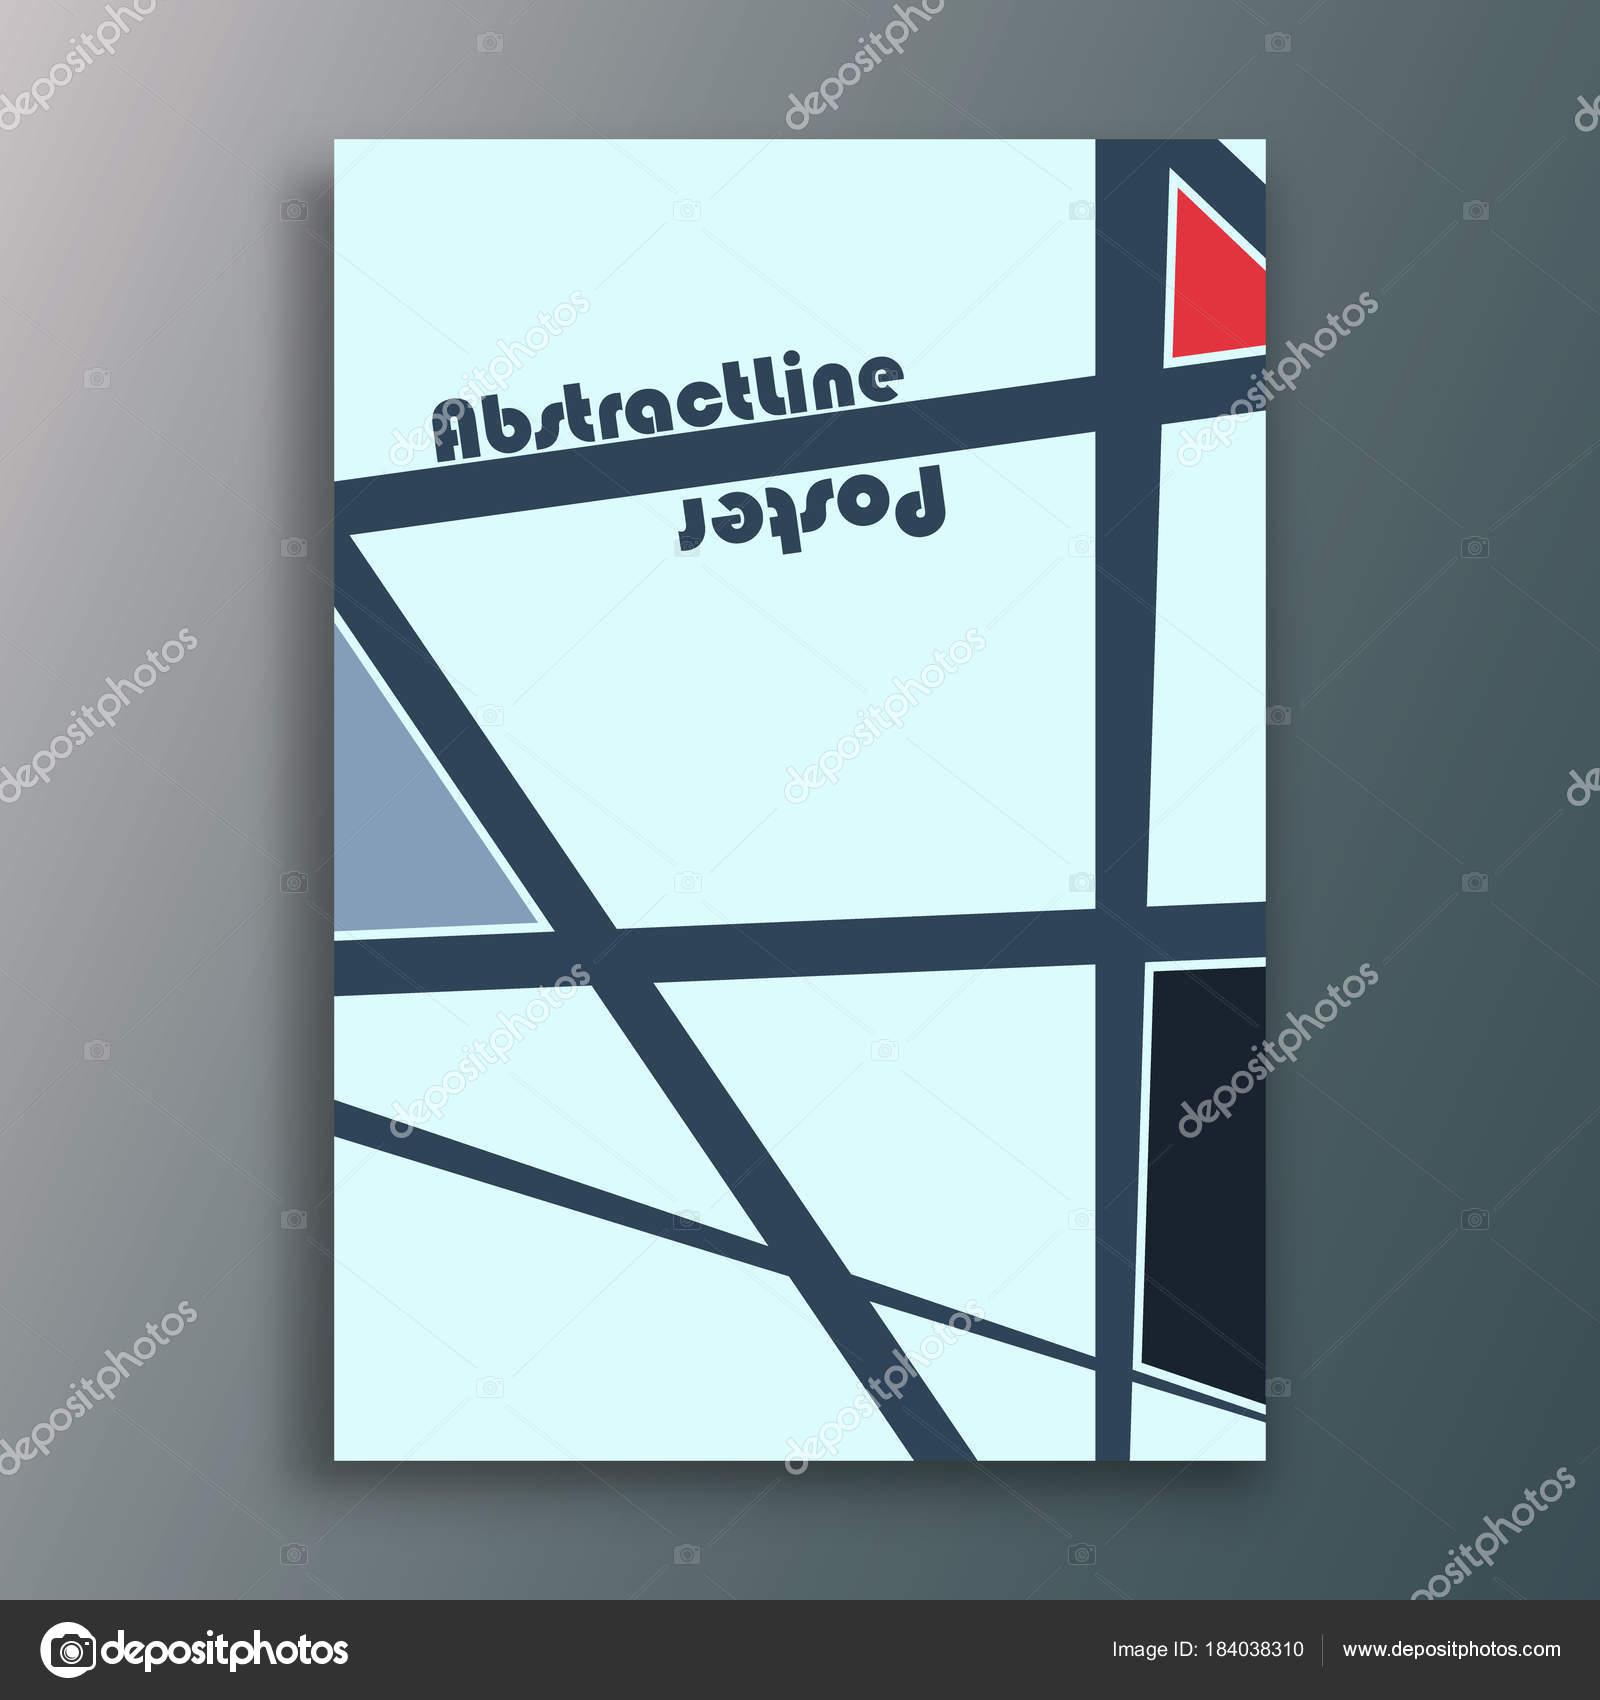 Gekreuzte Linien innen Plakat — Stockvektor © bobevv #184038310